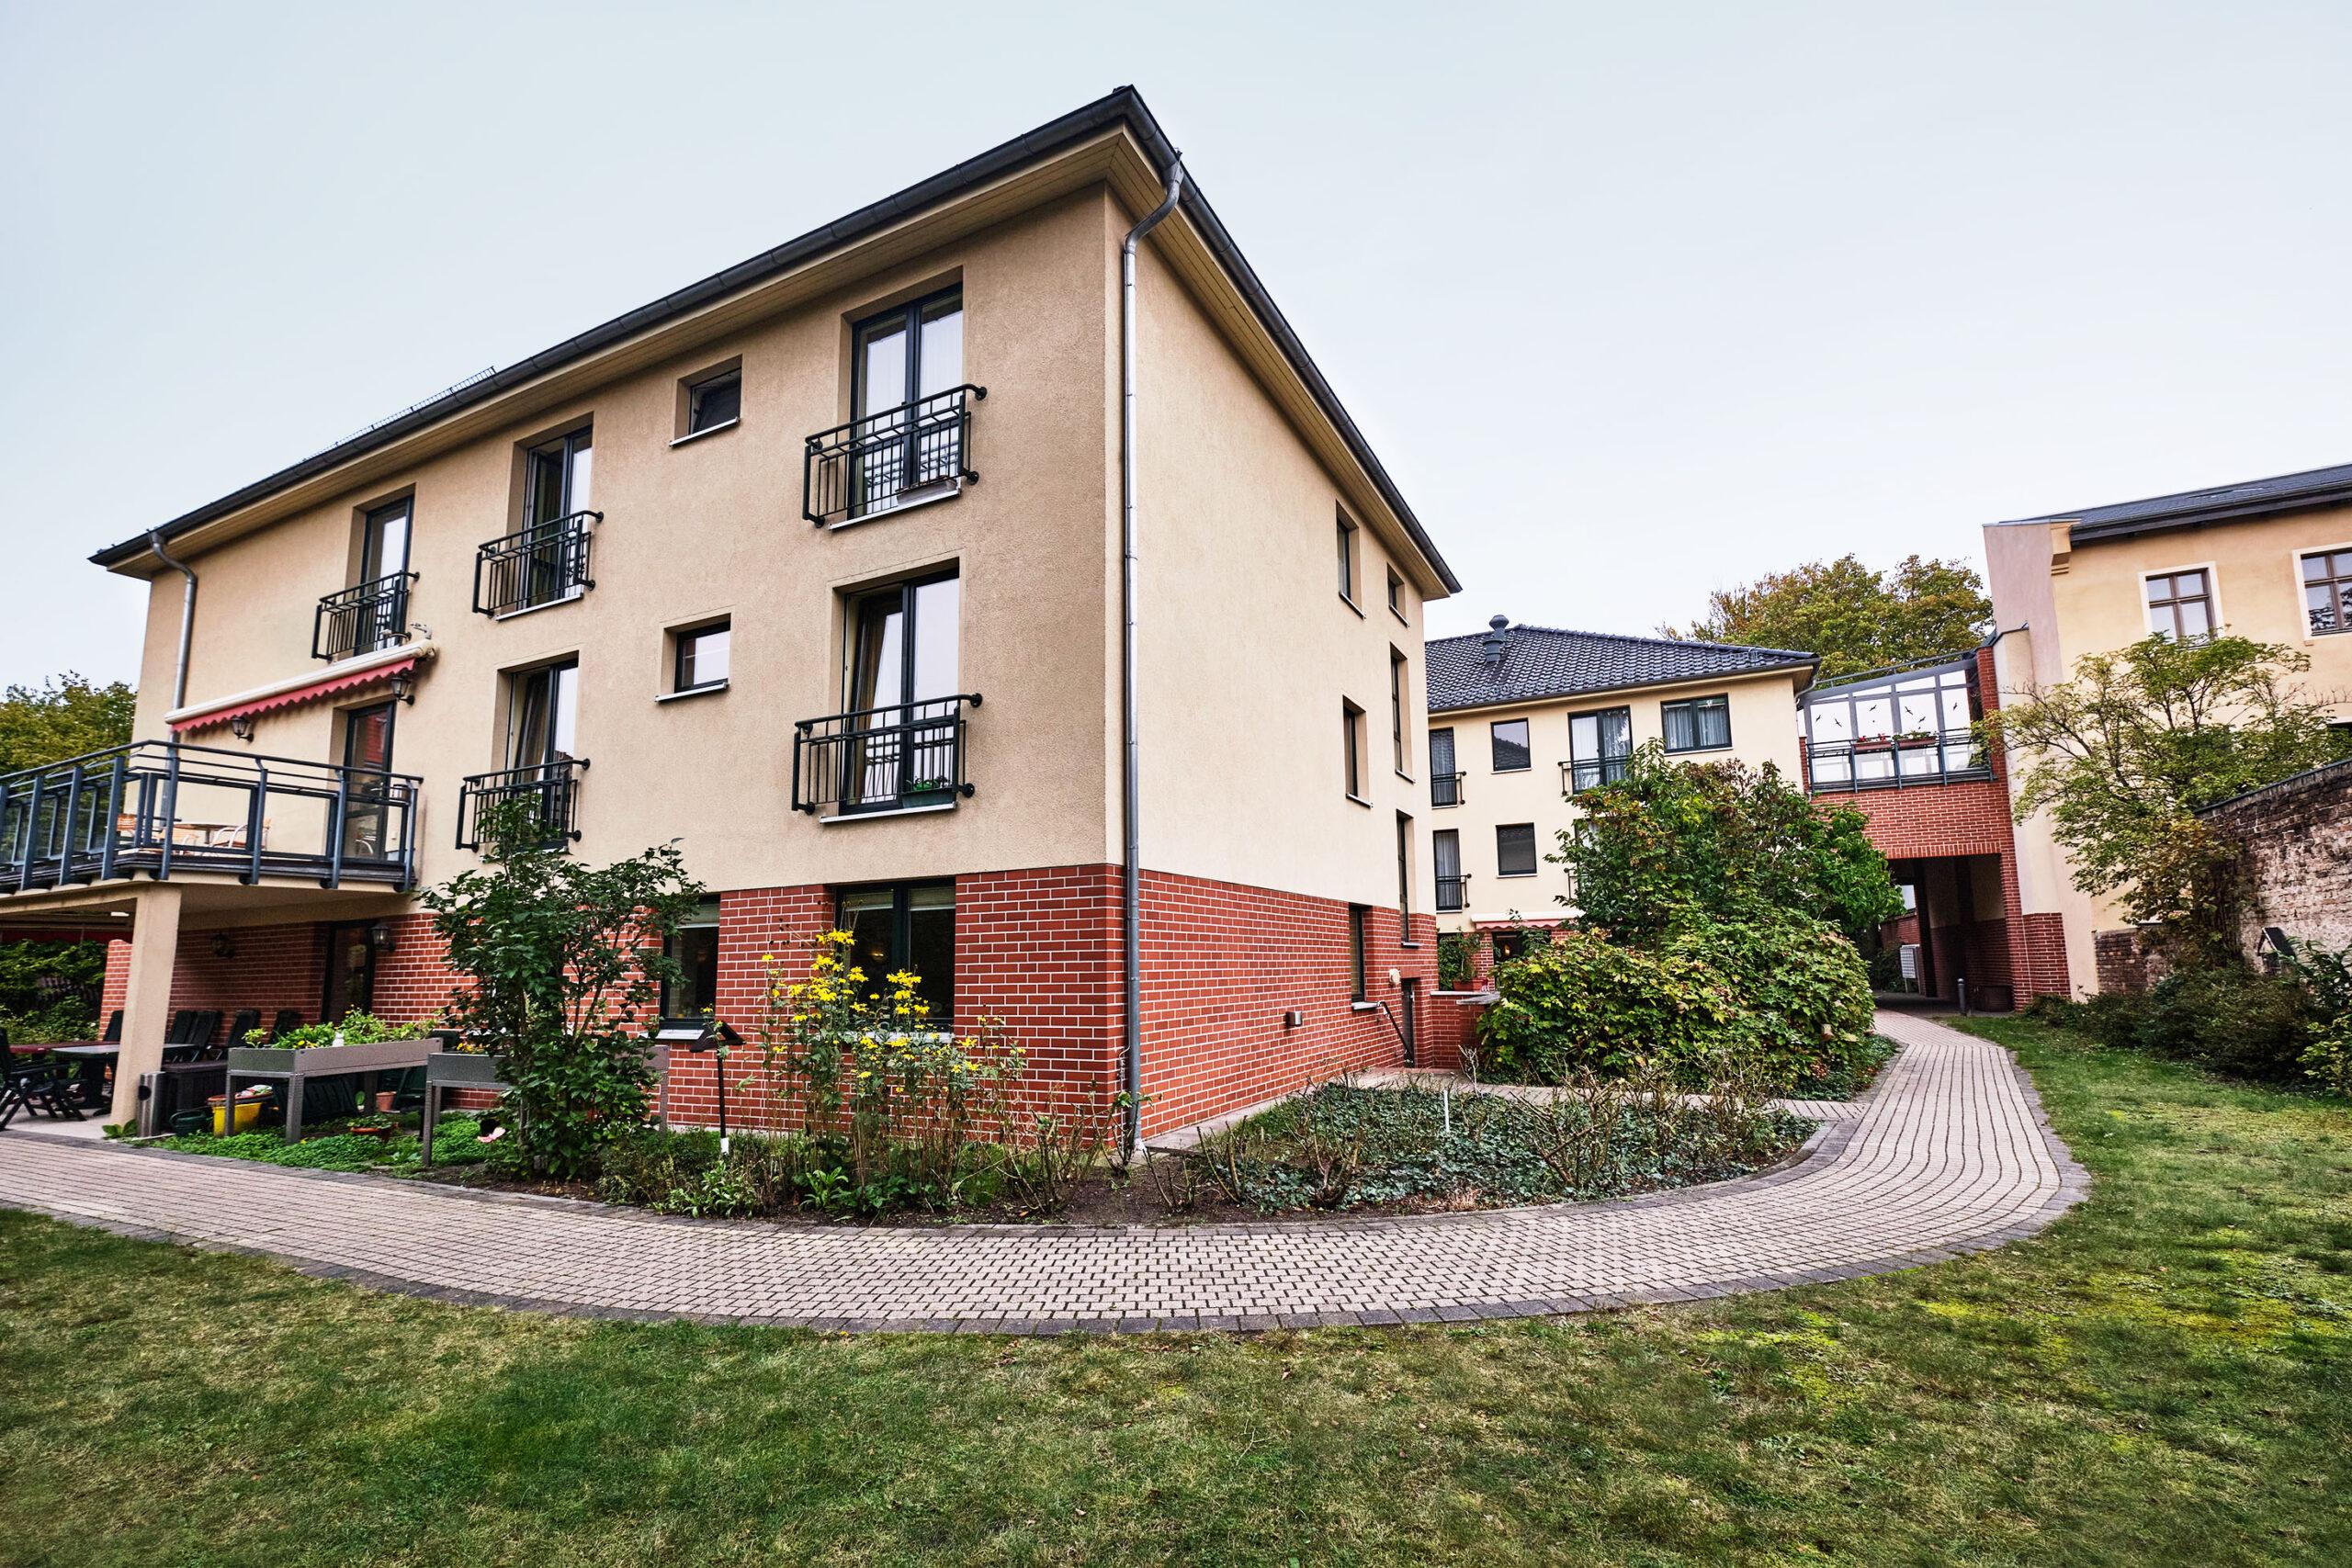 Potsdam_61